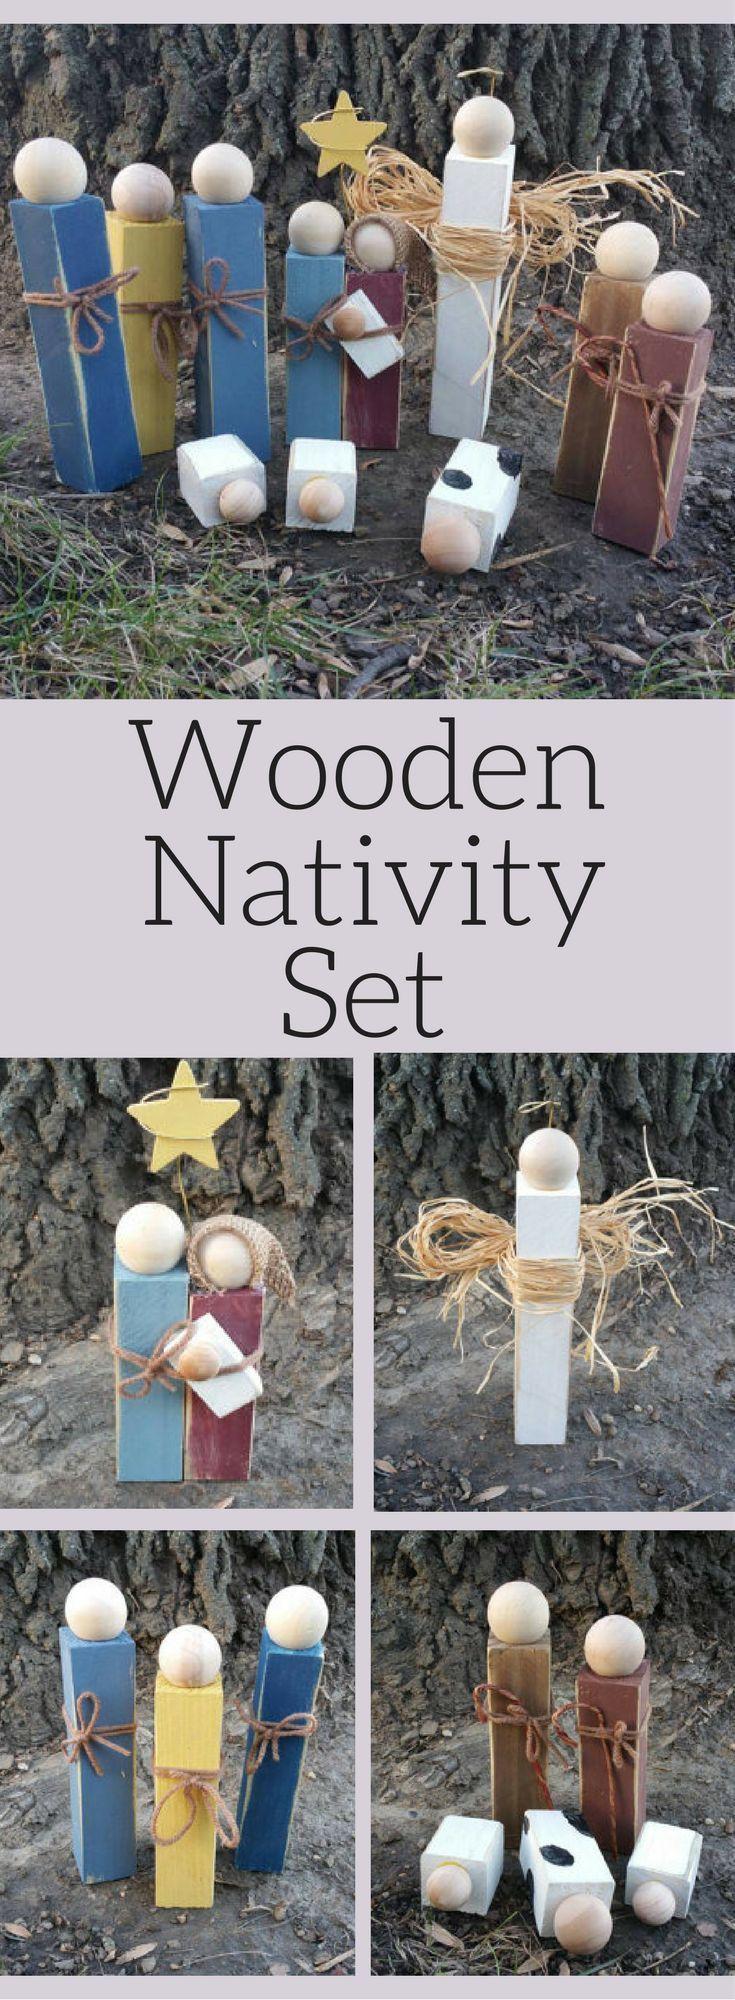 25+ unique Nativity scenes ideas on Pinterest